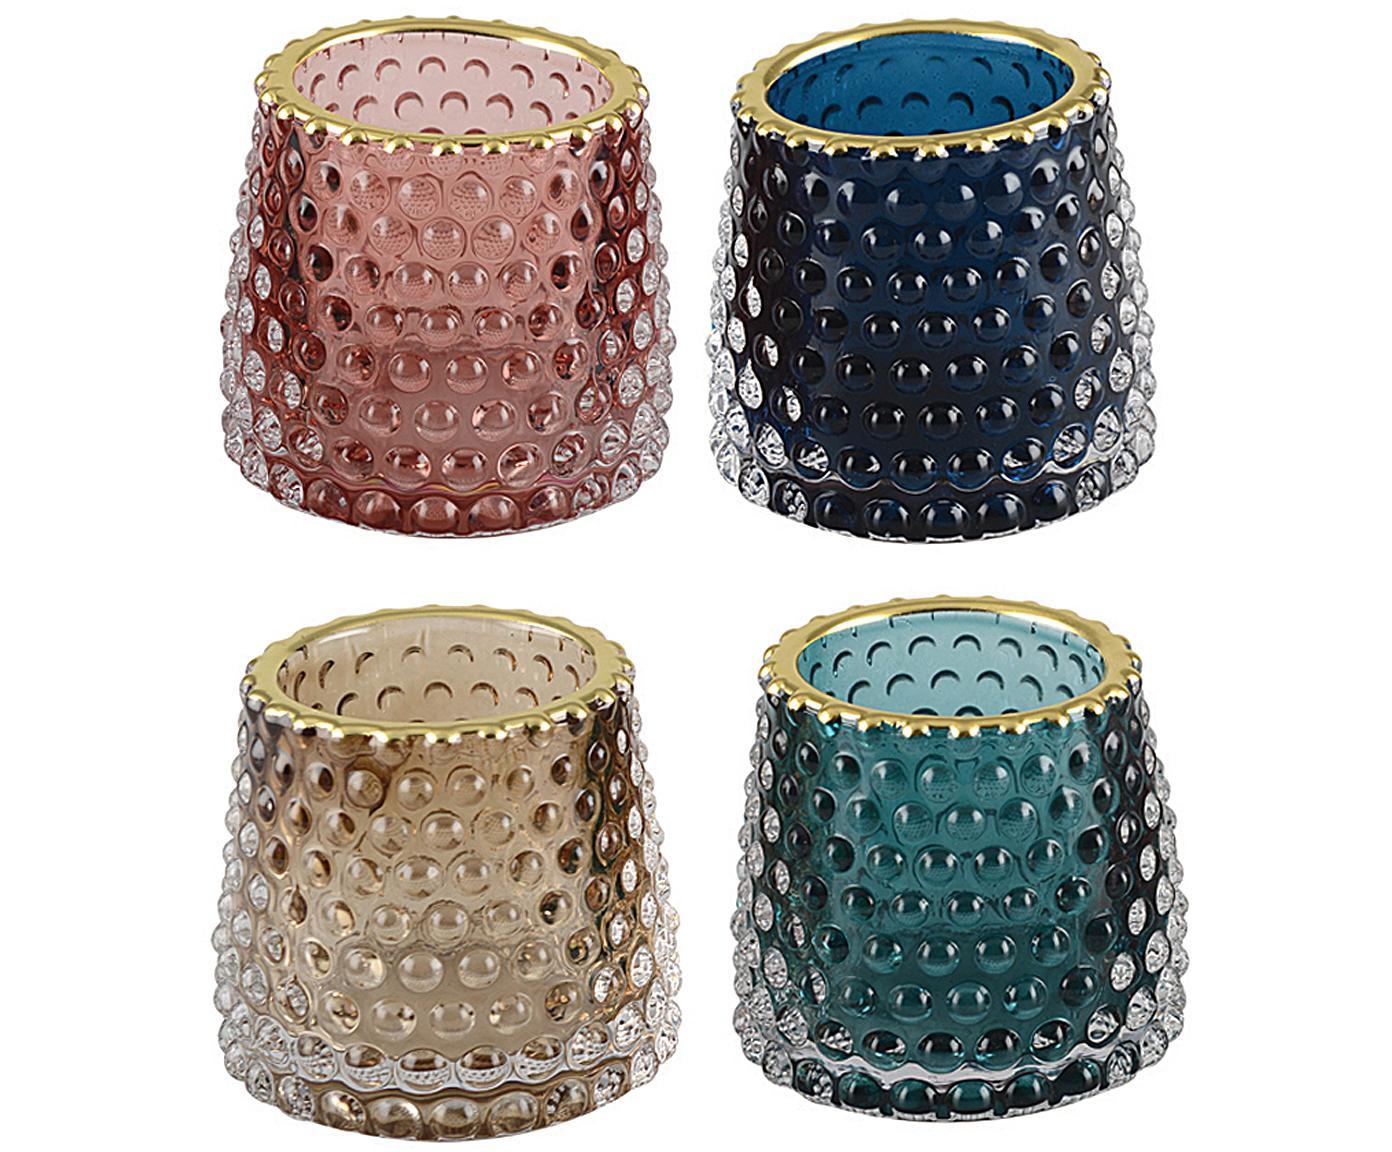 Windlichtenset Rimmon, 4-delig, Glas, Multicolour, Ø 8 x H 7 cm